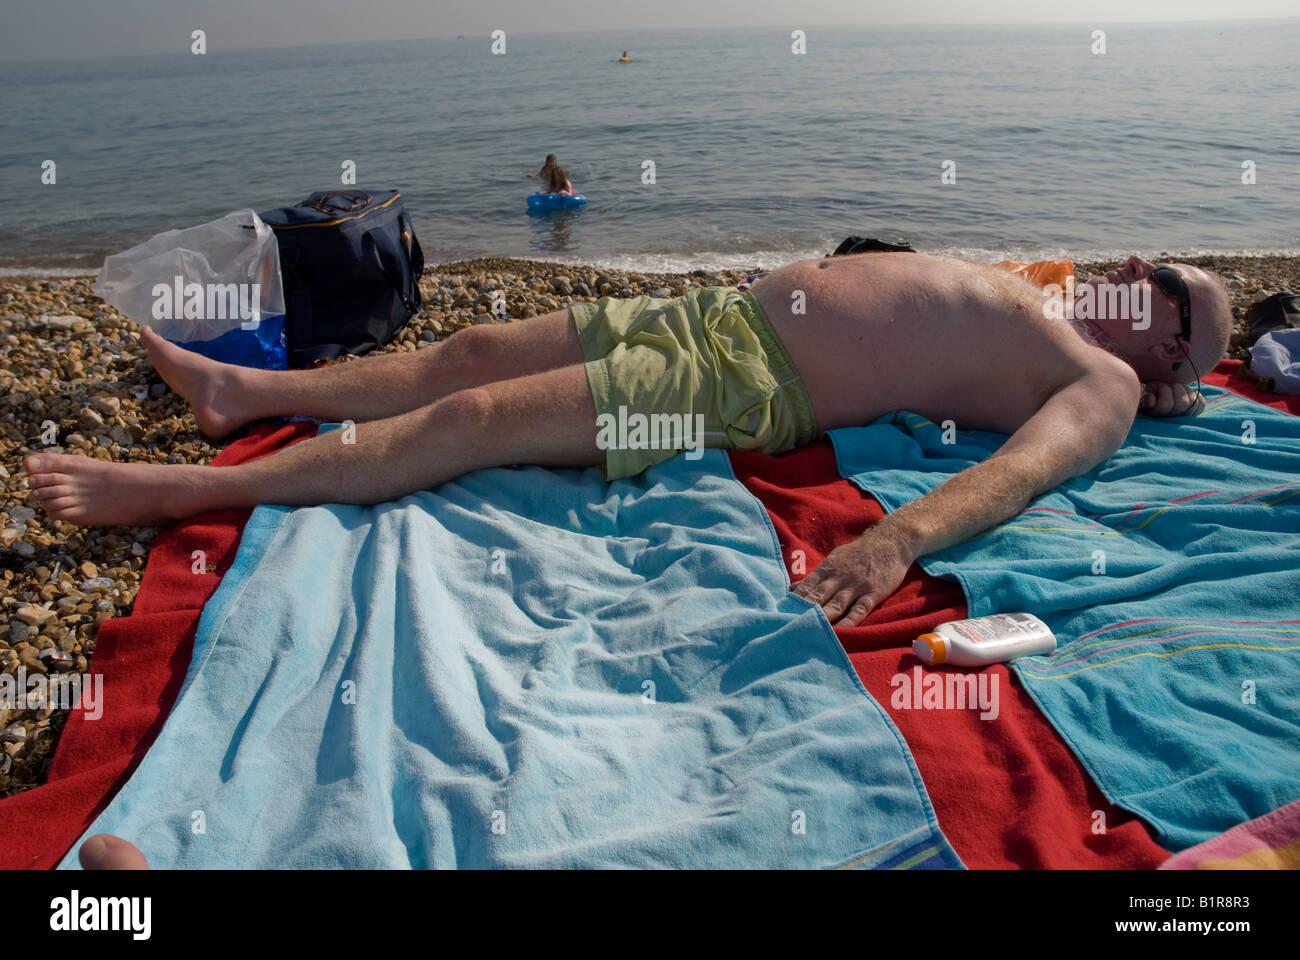 A man sunbathes on the beach at Salt Dean Sussex near Brighton - Stock Image